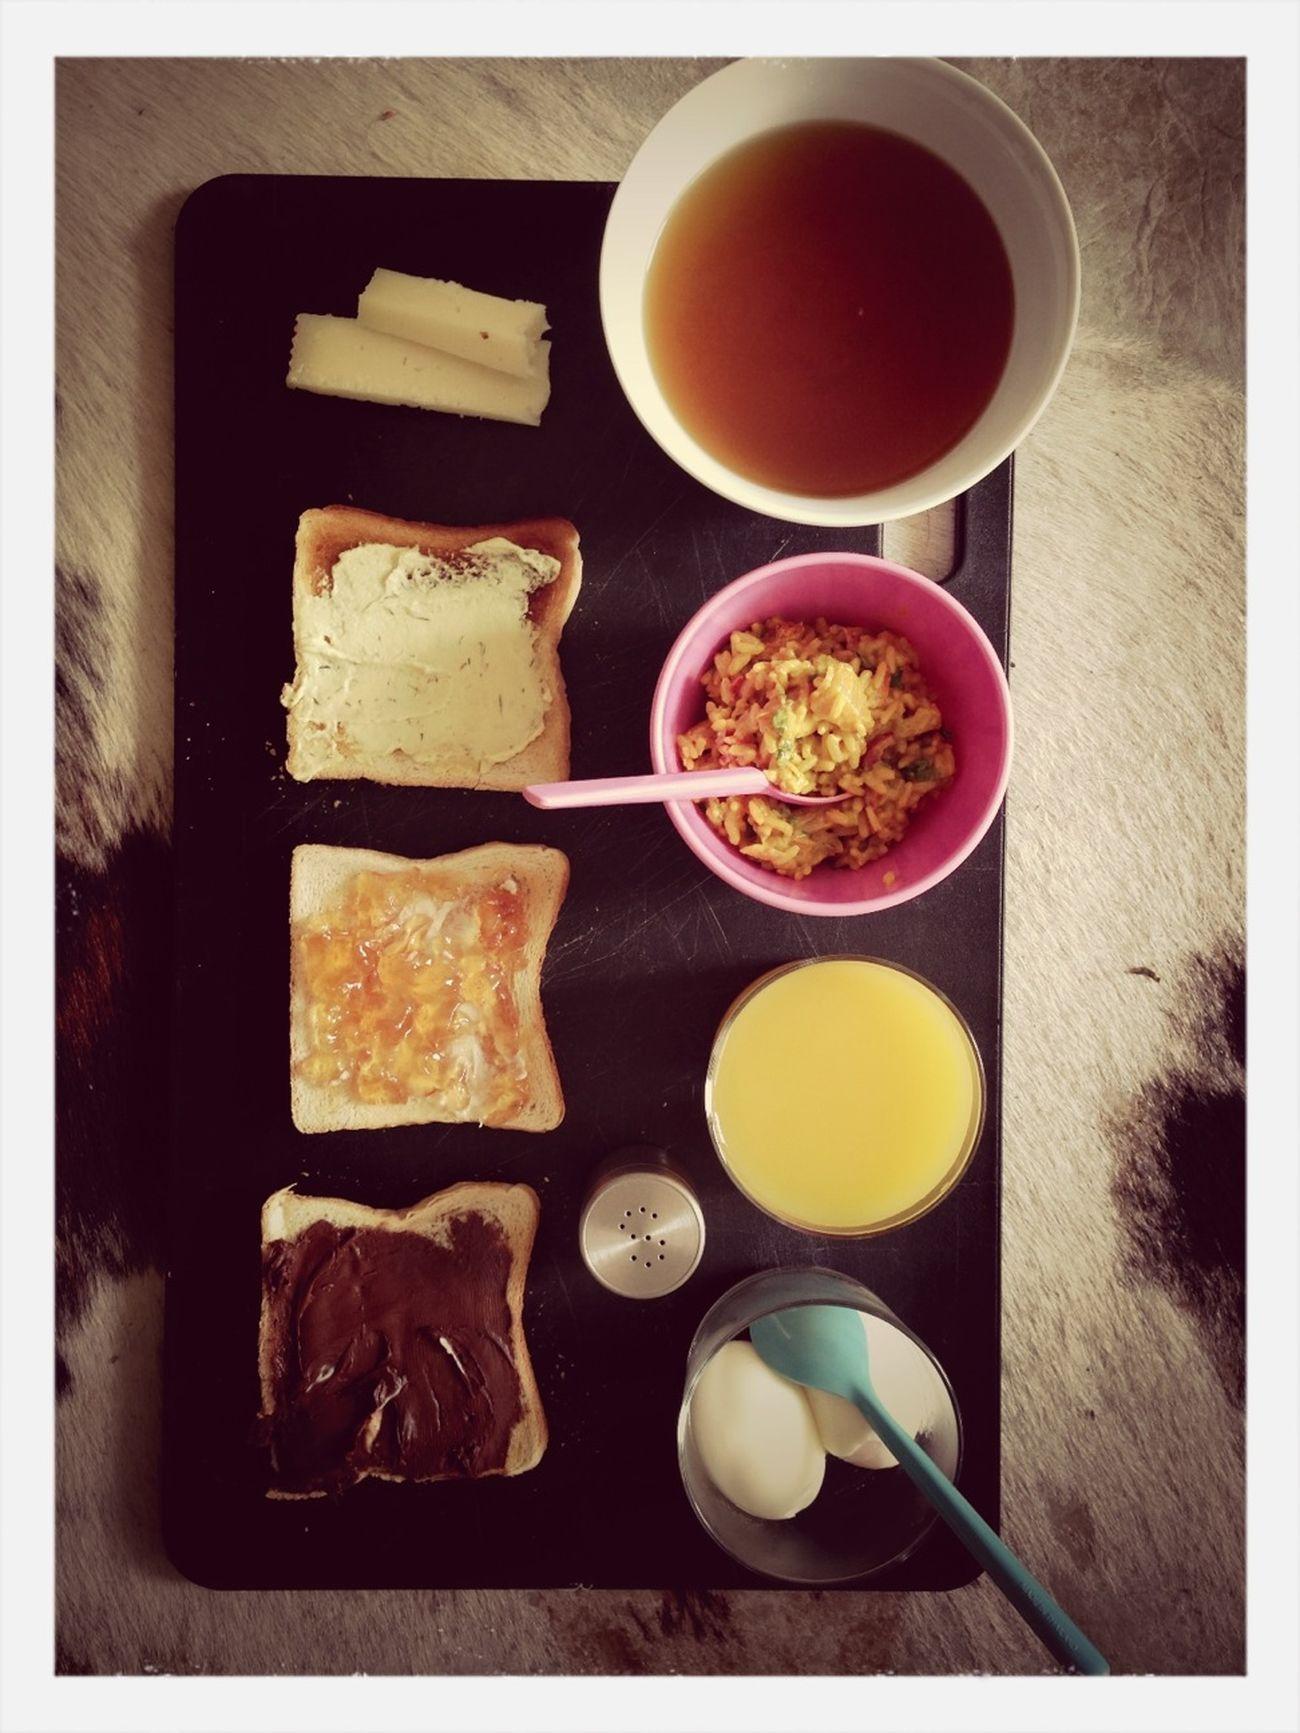 Früüüühstück